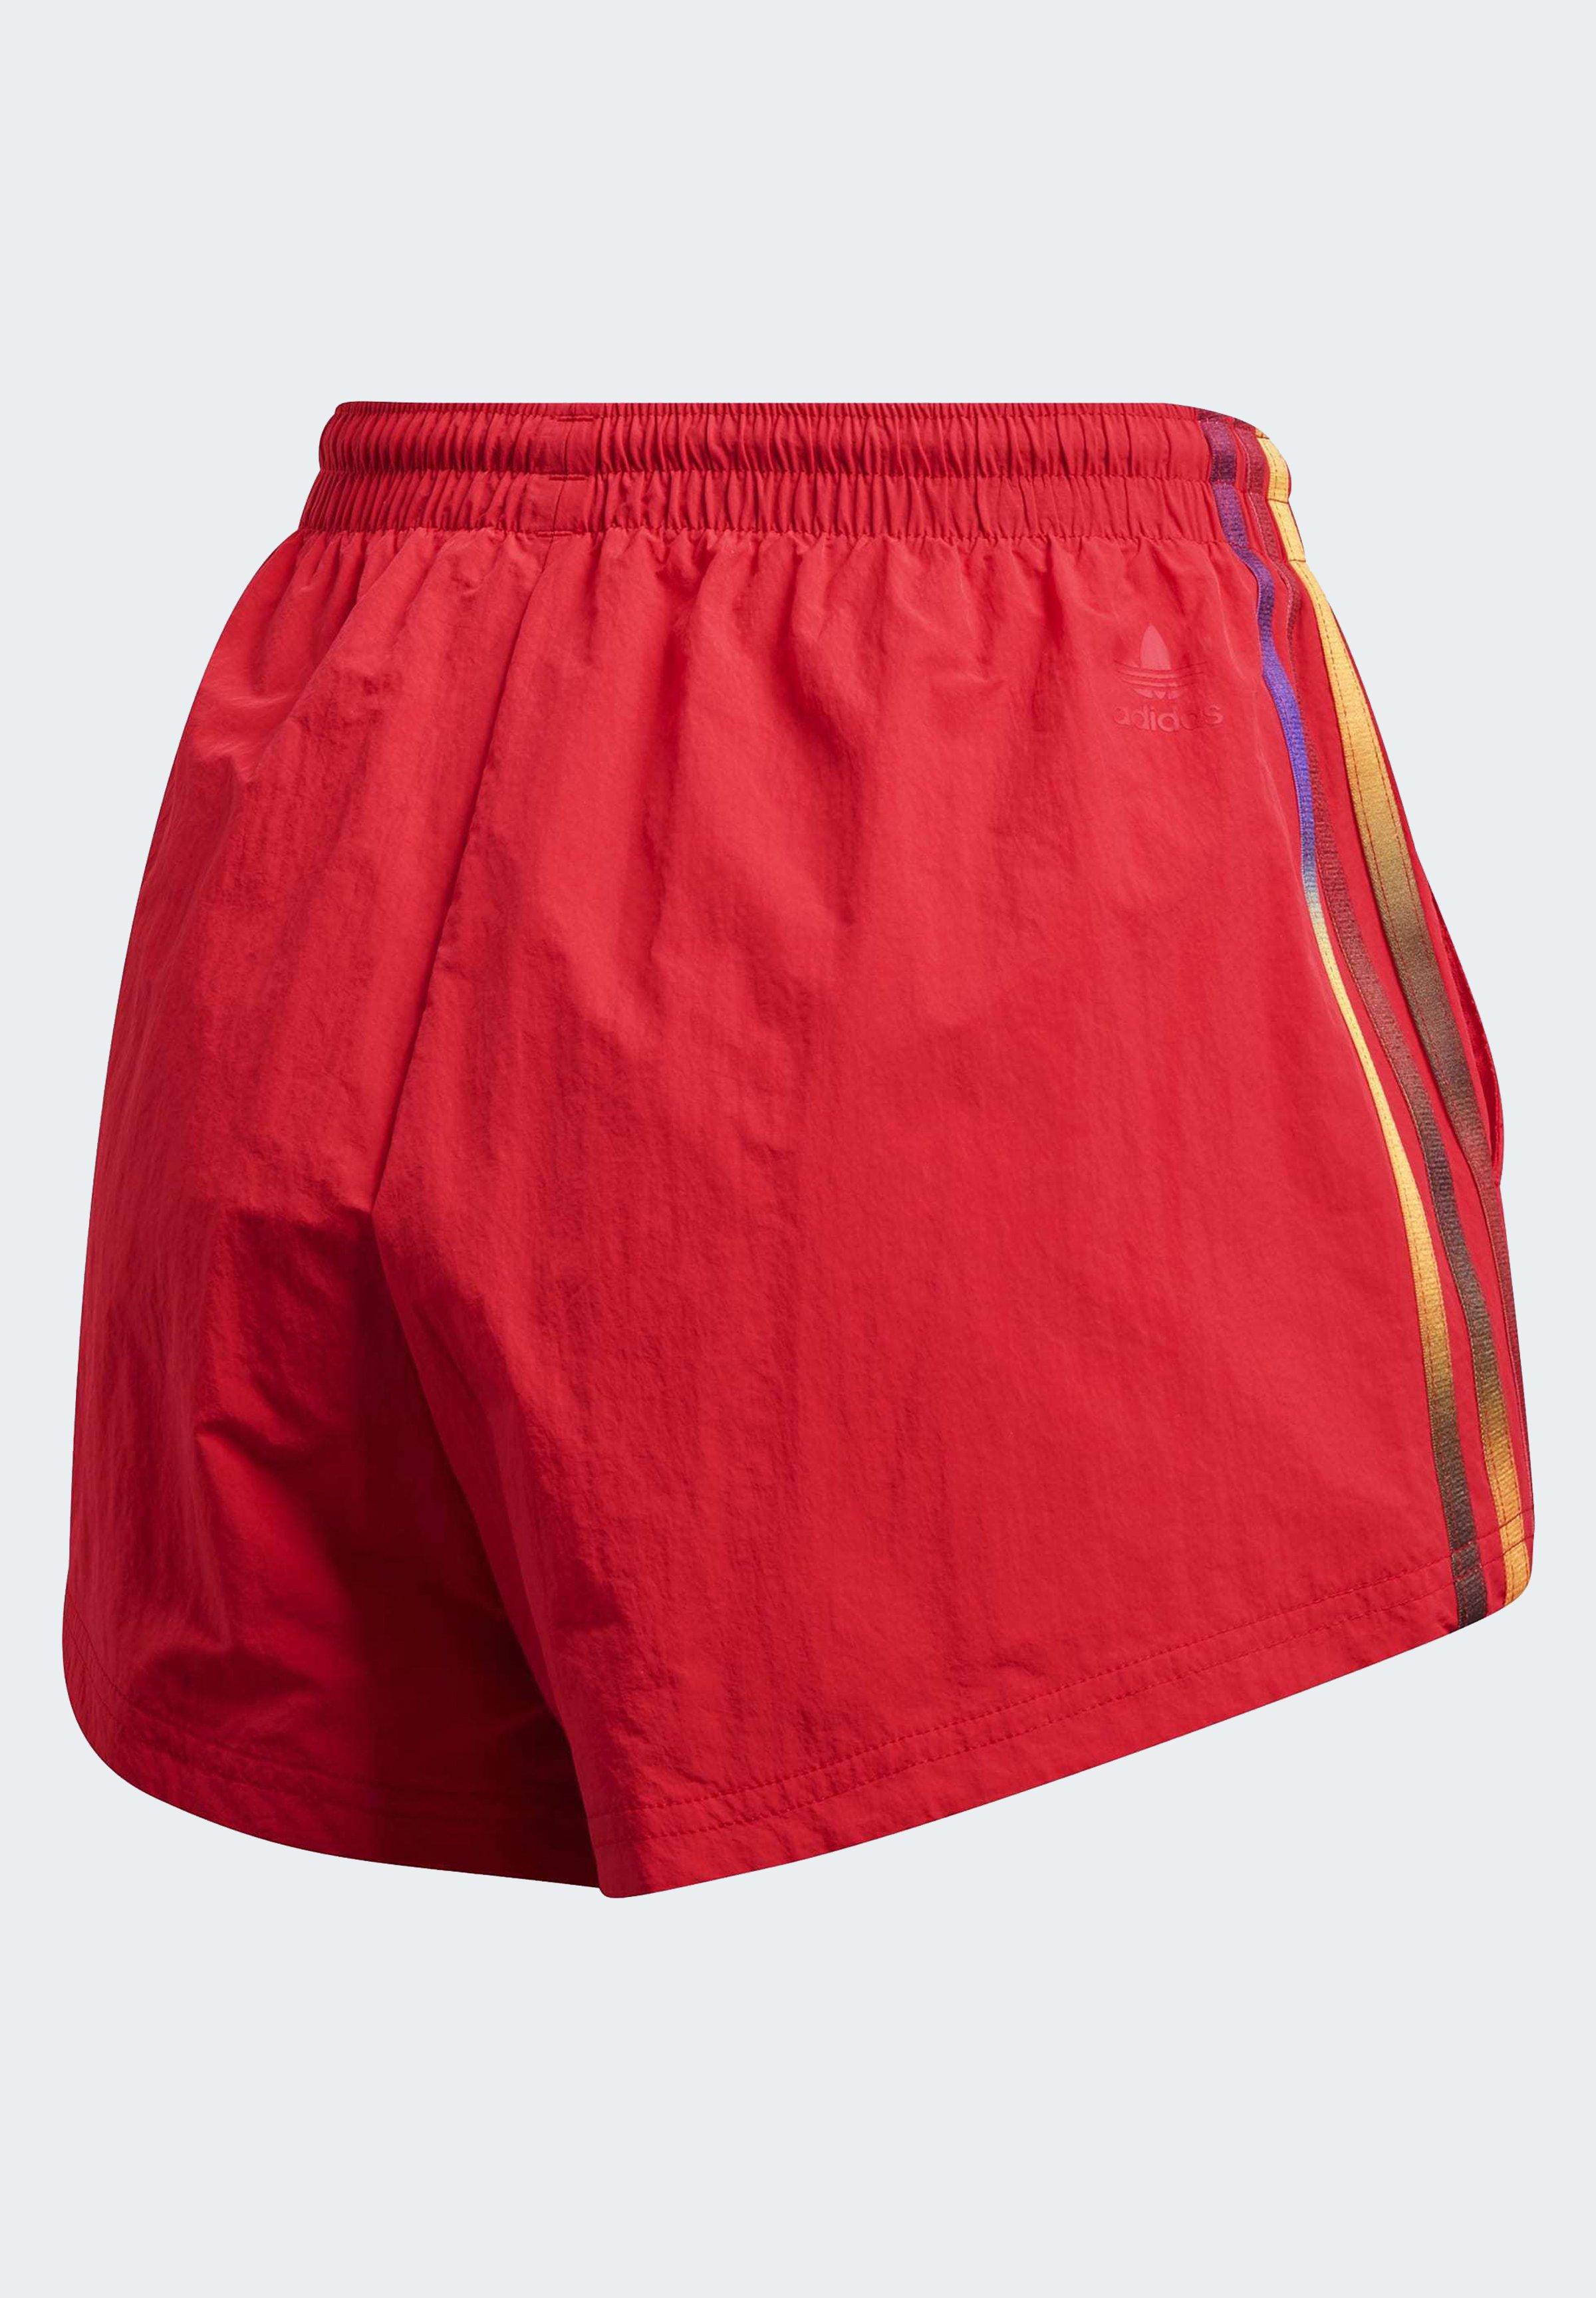 Adidas Originals 3 Stripe Short Shorts Trace Scarlet White